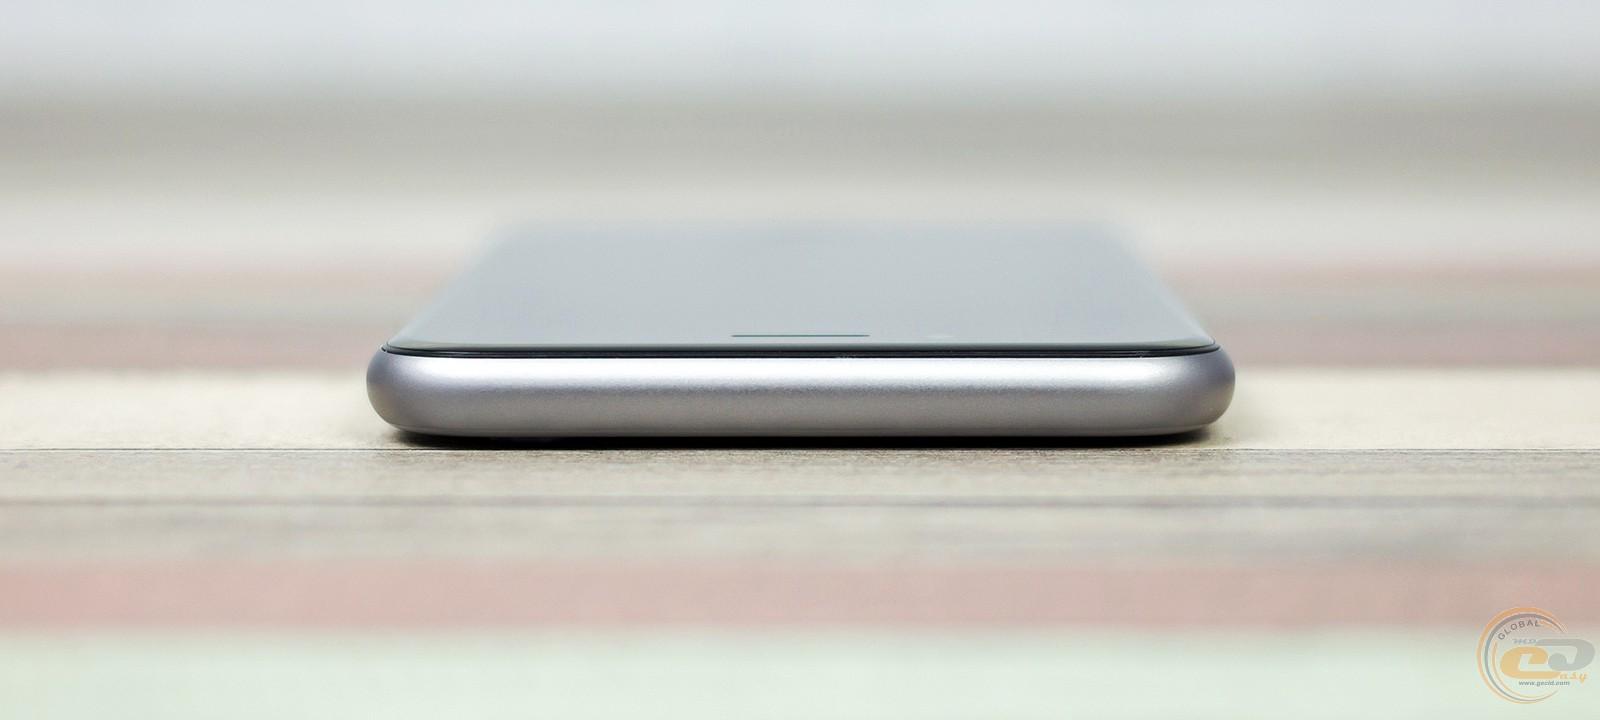 Apple Phone Iphone